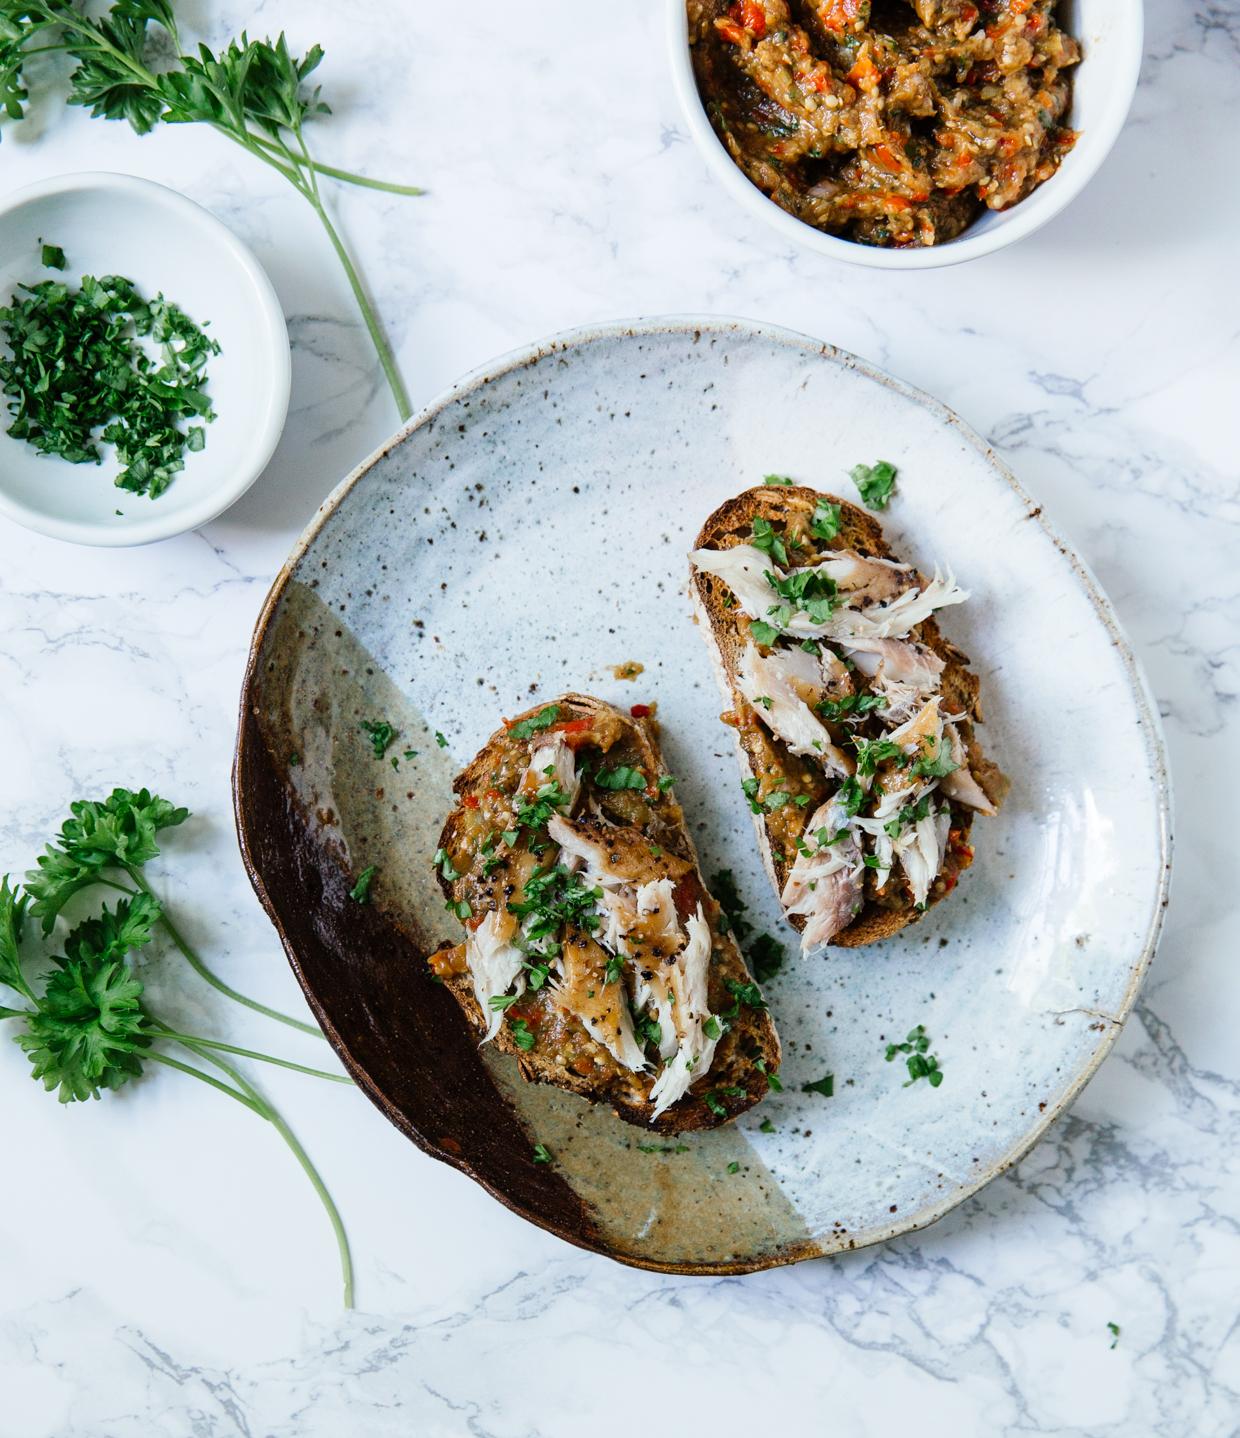 Roasted aubergine & smoked mackerel crostini